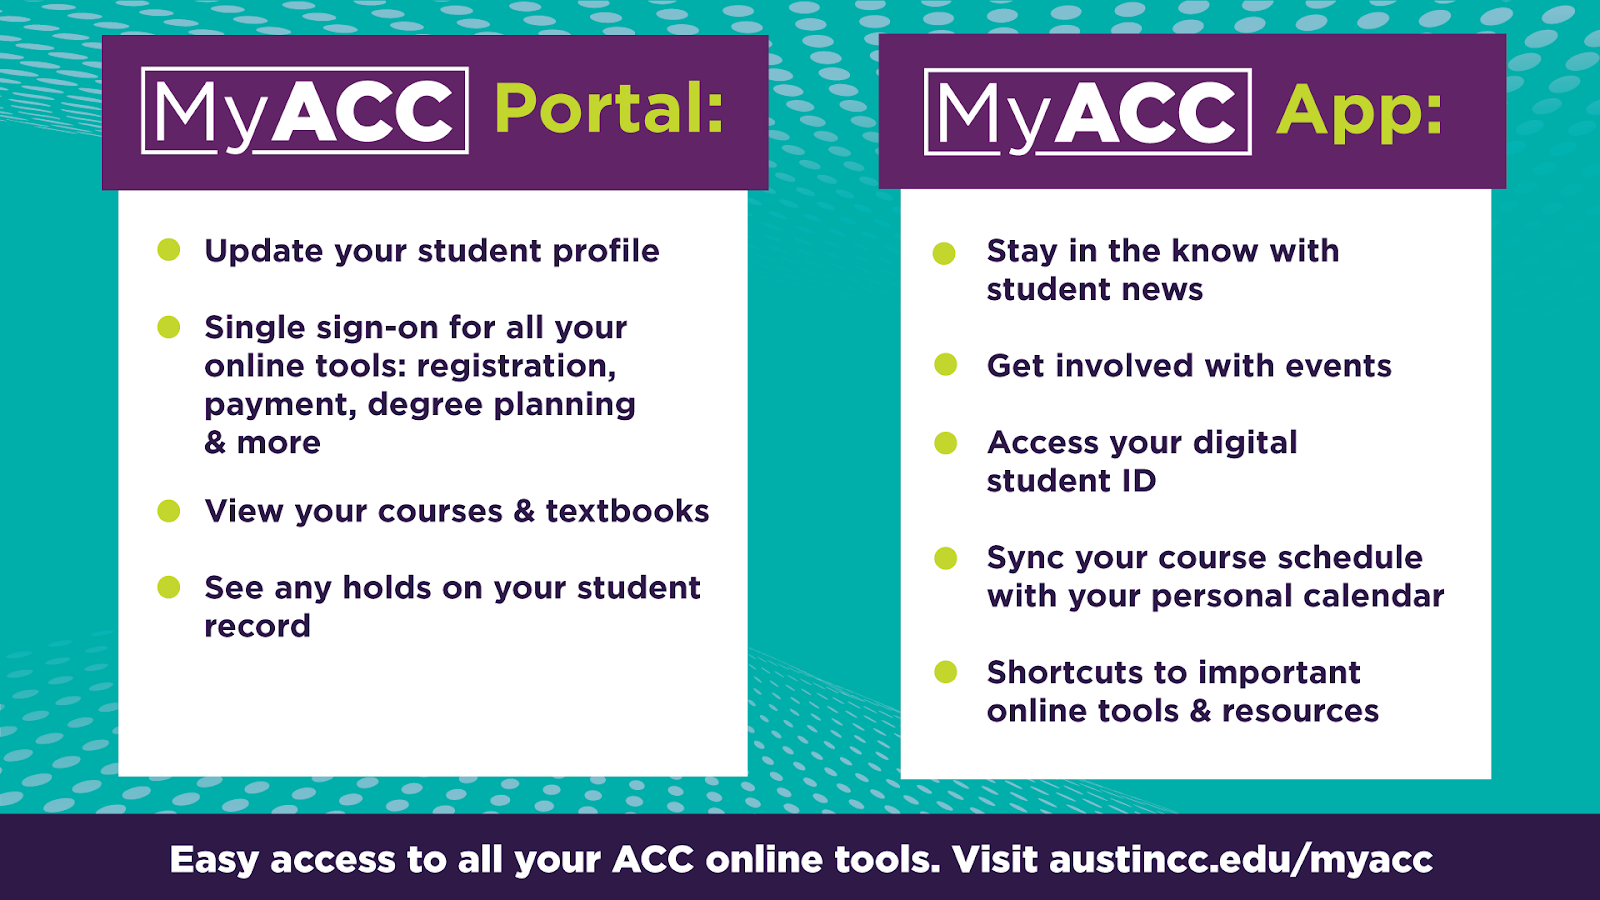 MyACC portal and app information